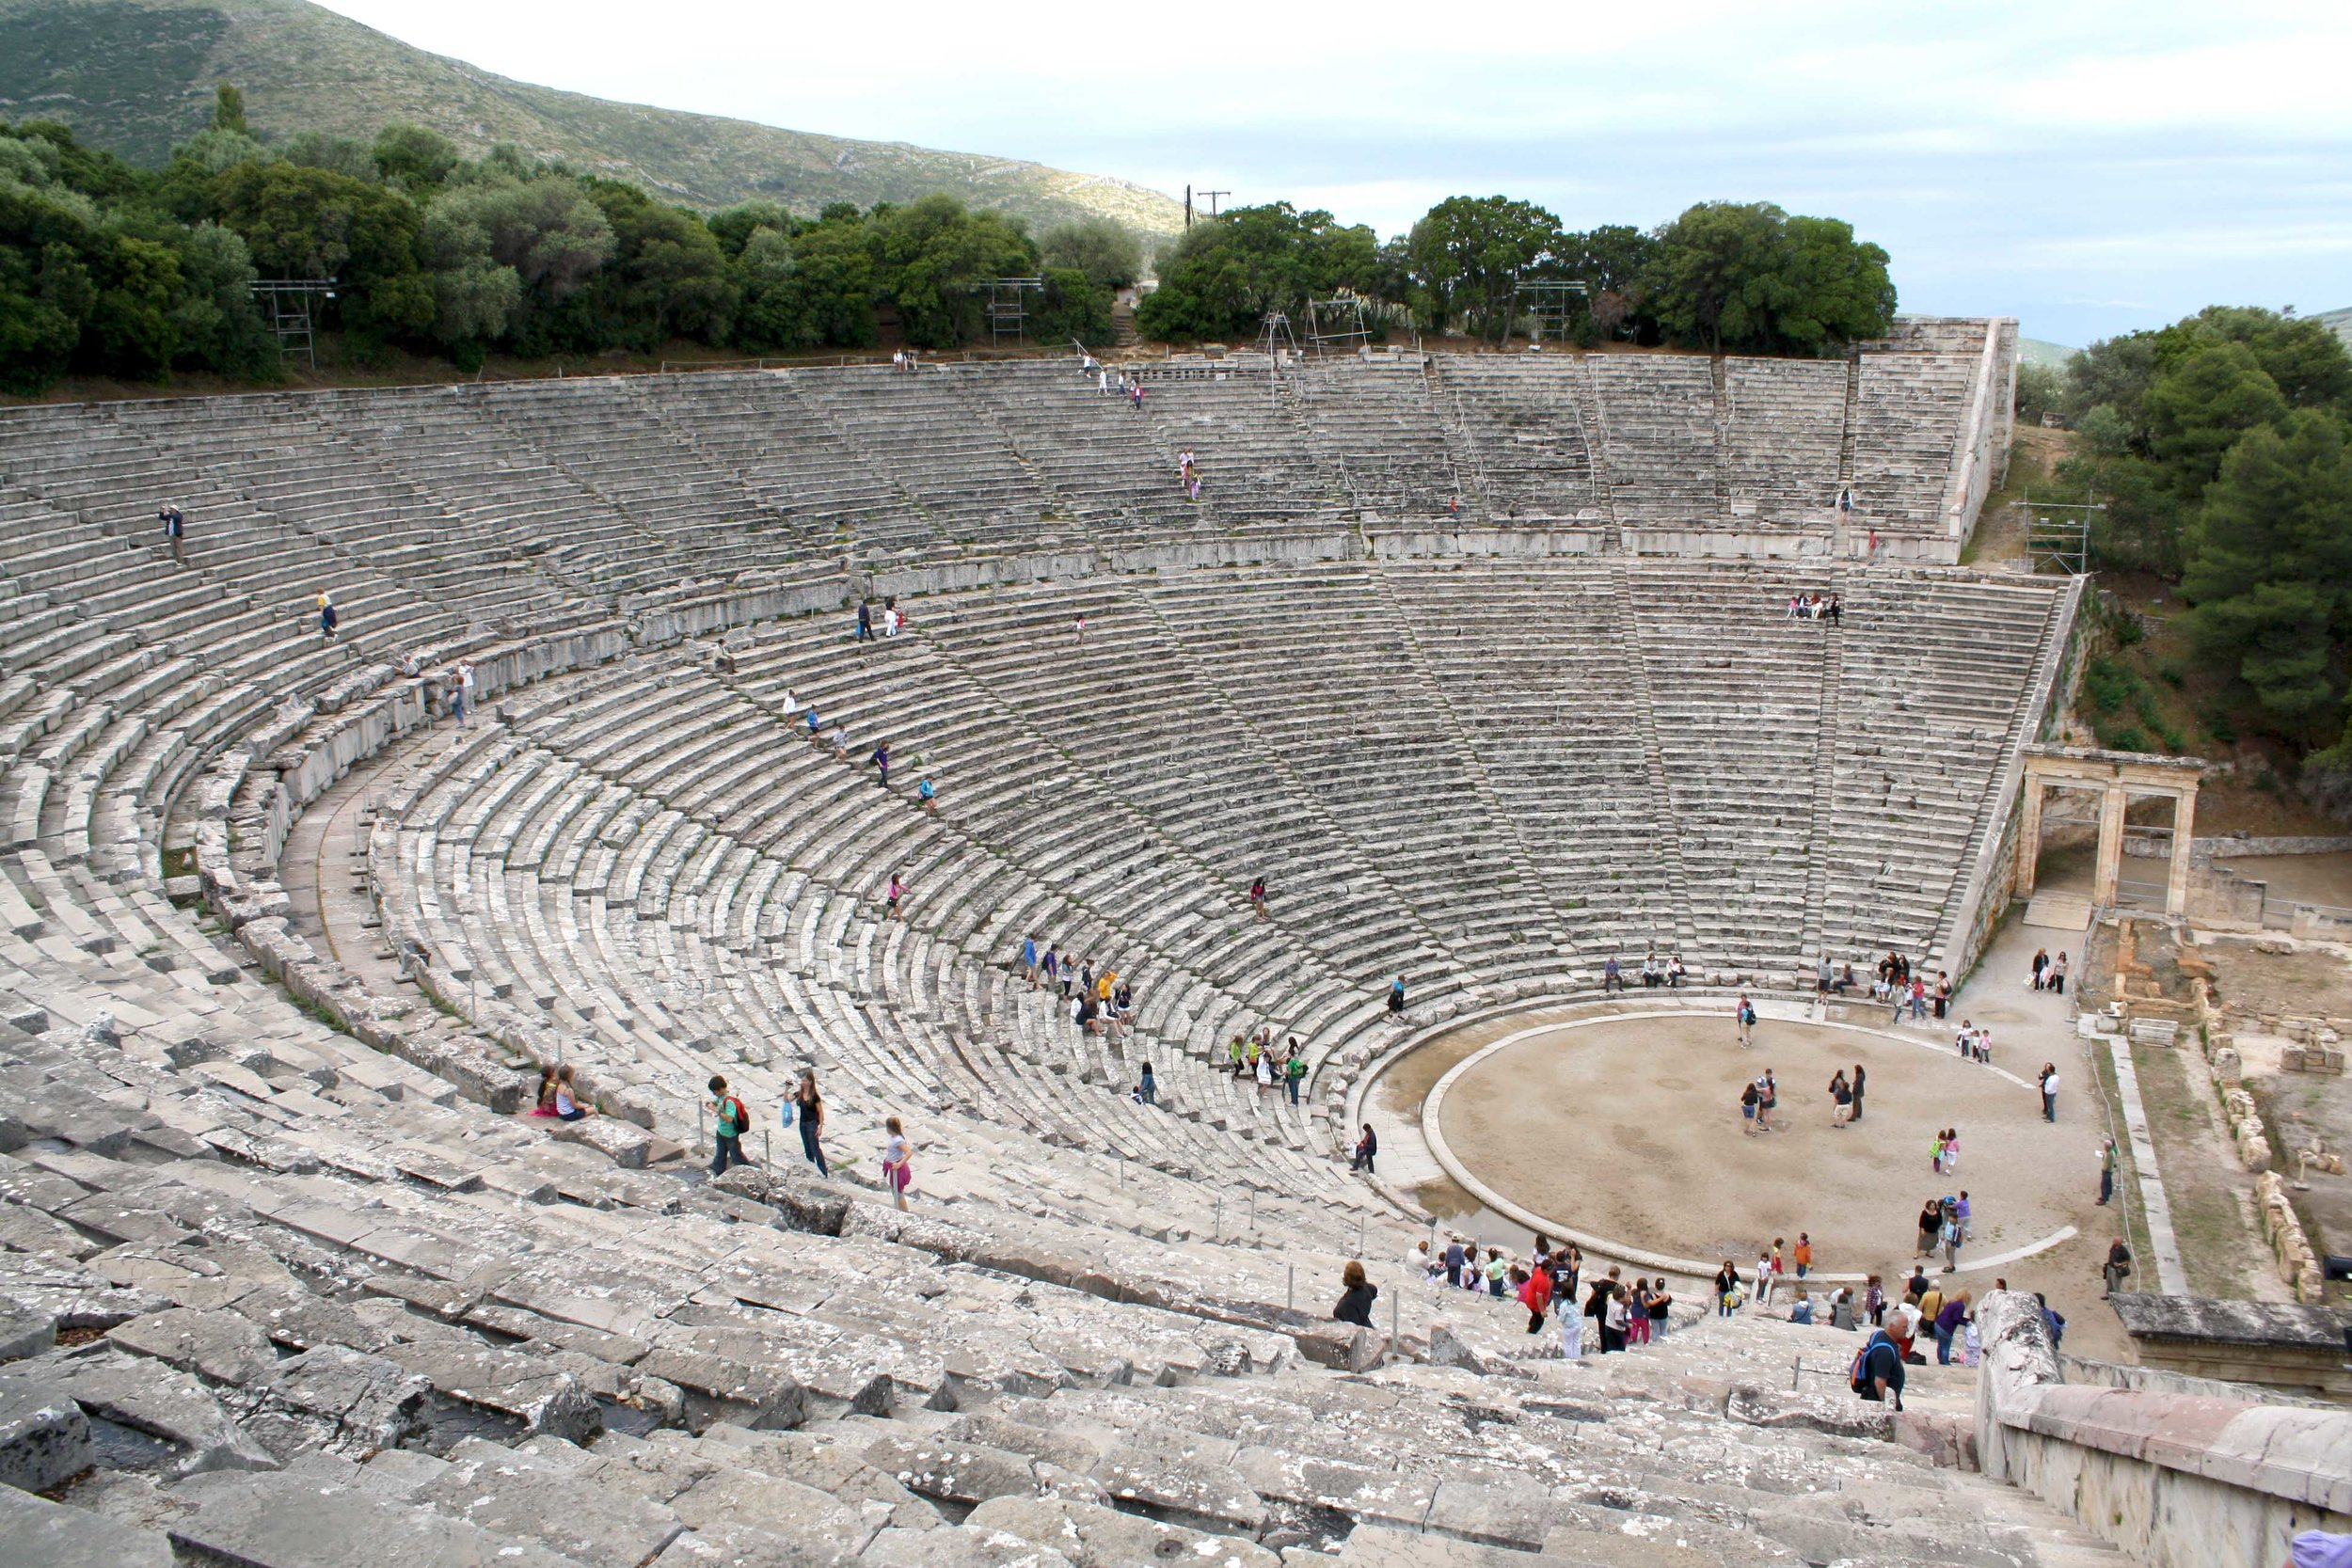 The Theater of Epidavros